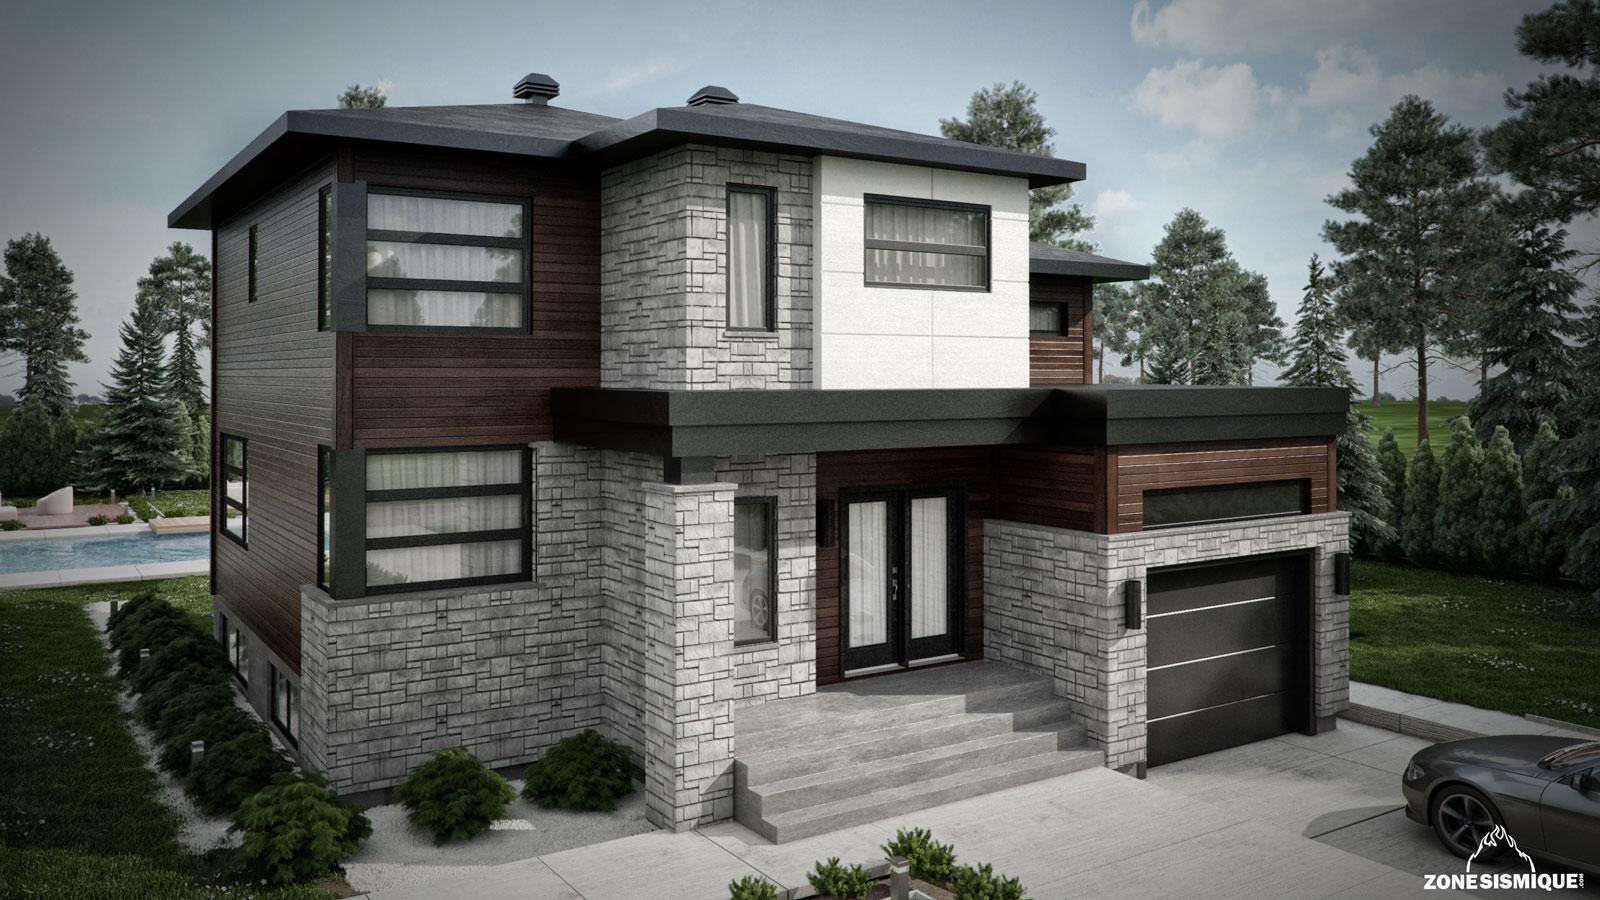 zone-sismique-habitation-malie-maison-moderne-3d-modele-2-v1 - _- ...